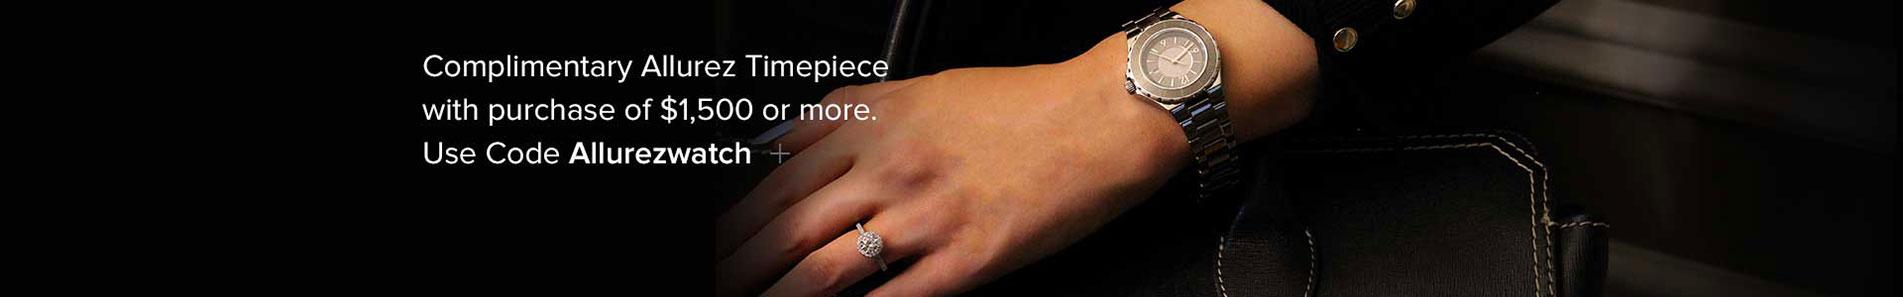 Free Complimentary Allurez Timepiece